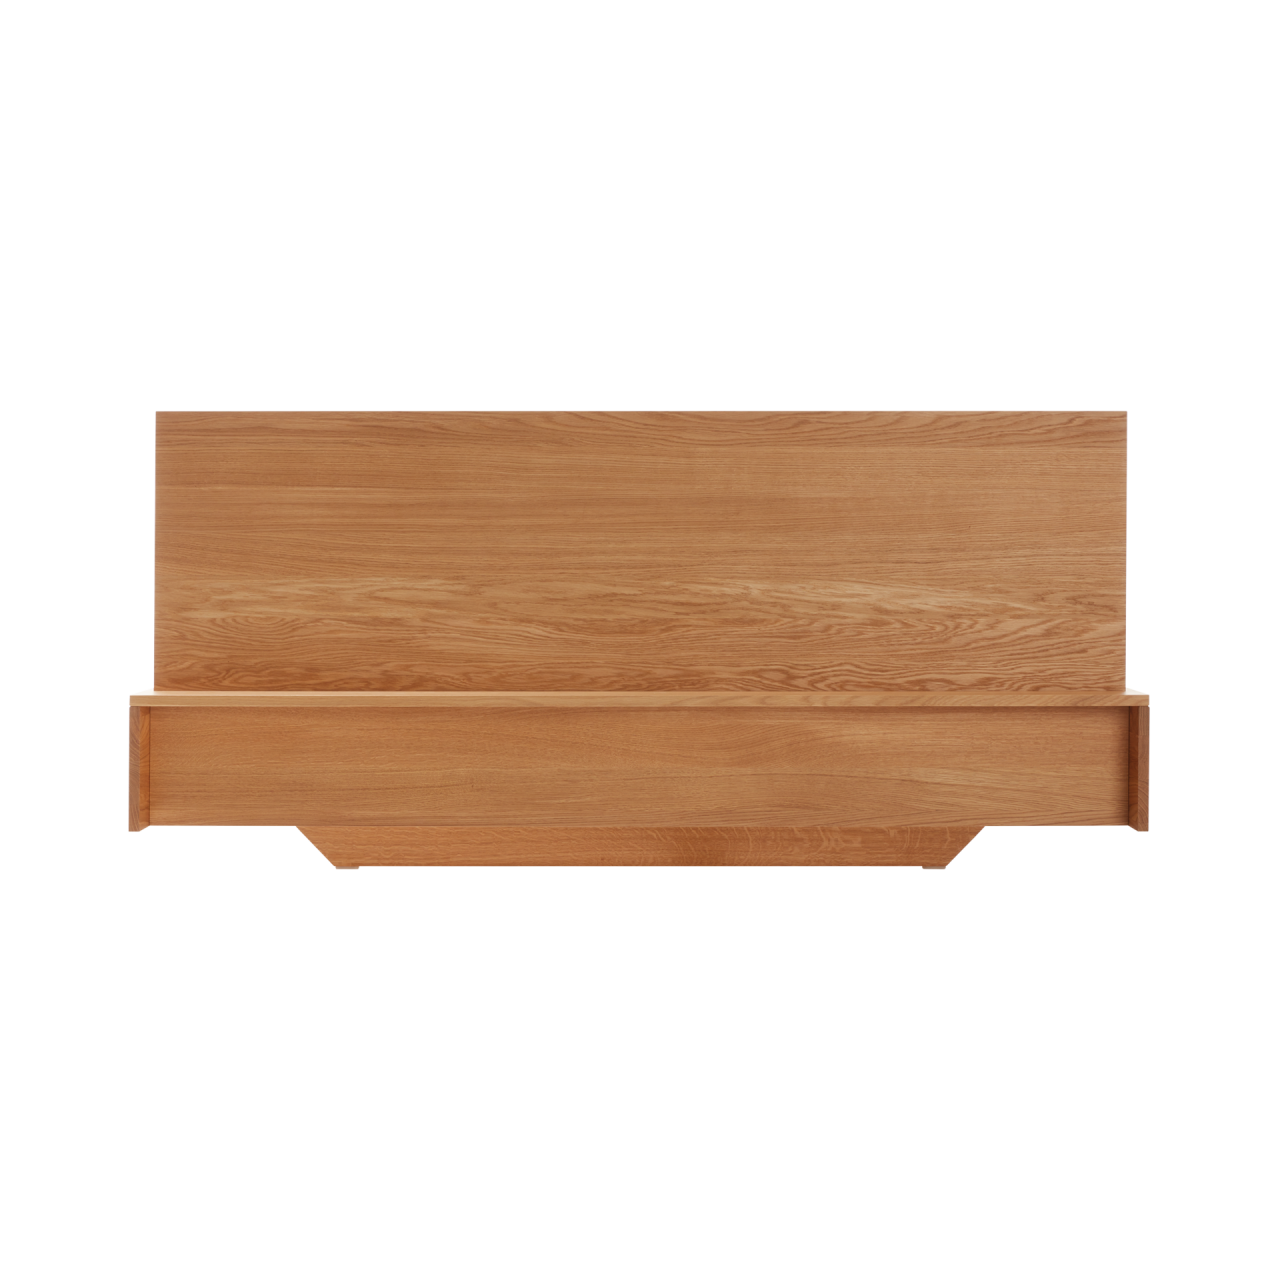 FLAI Bed Headboard oak